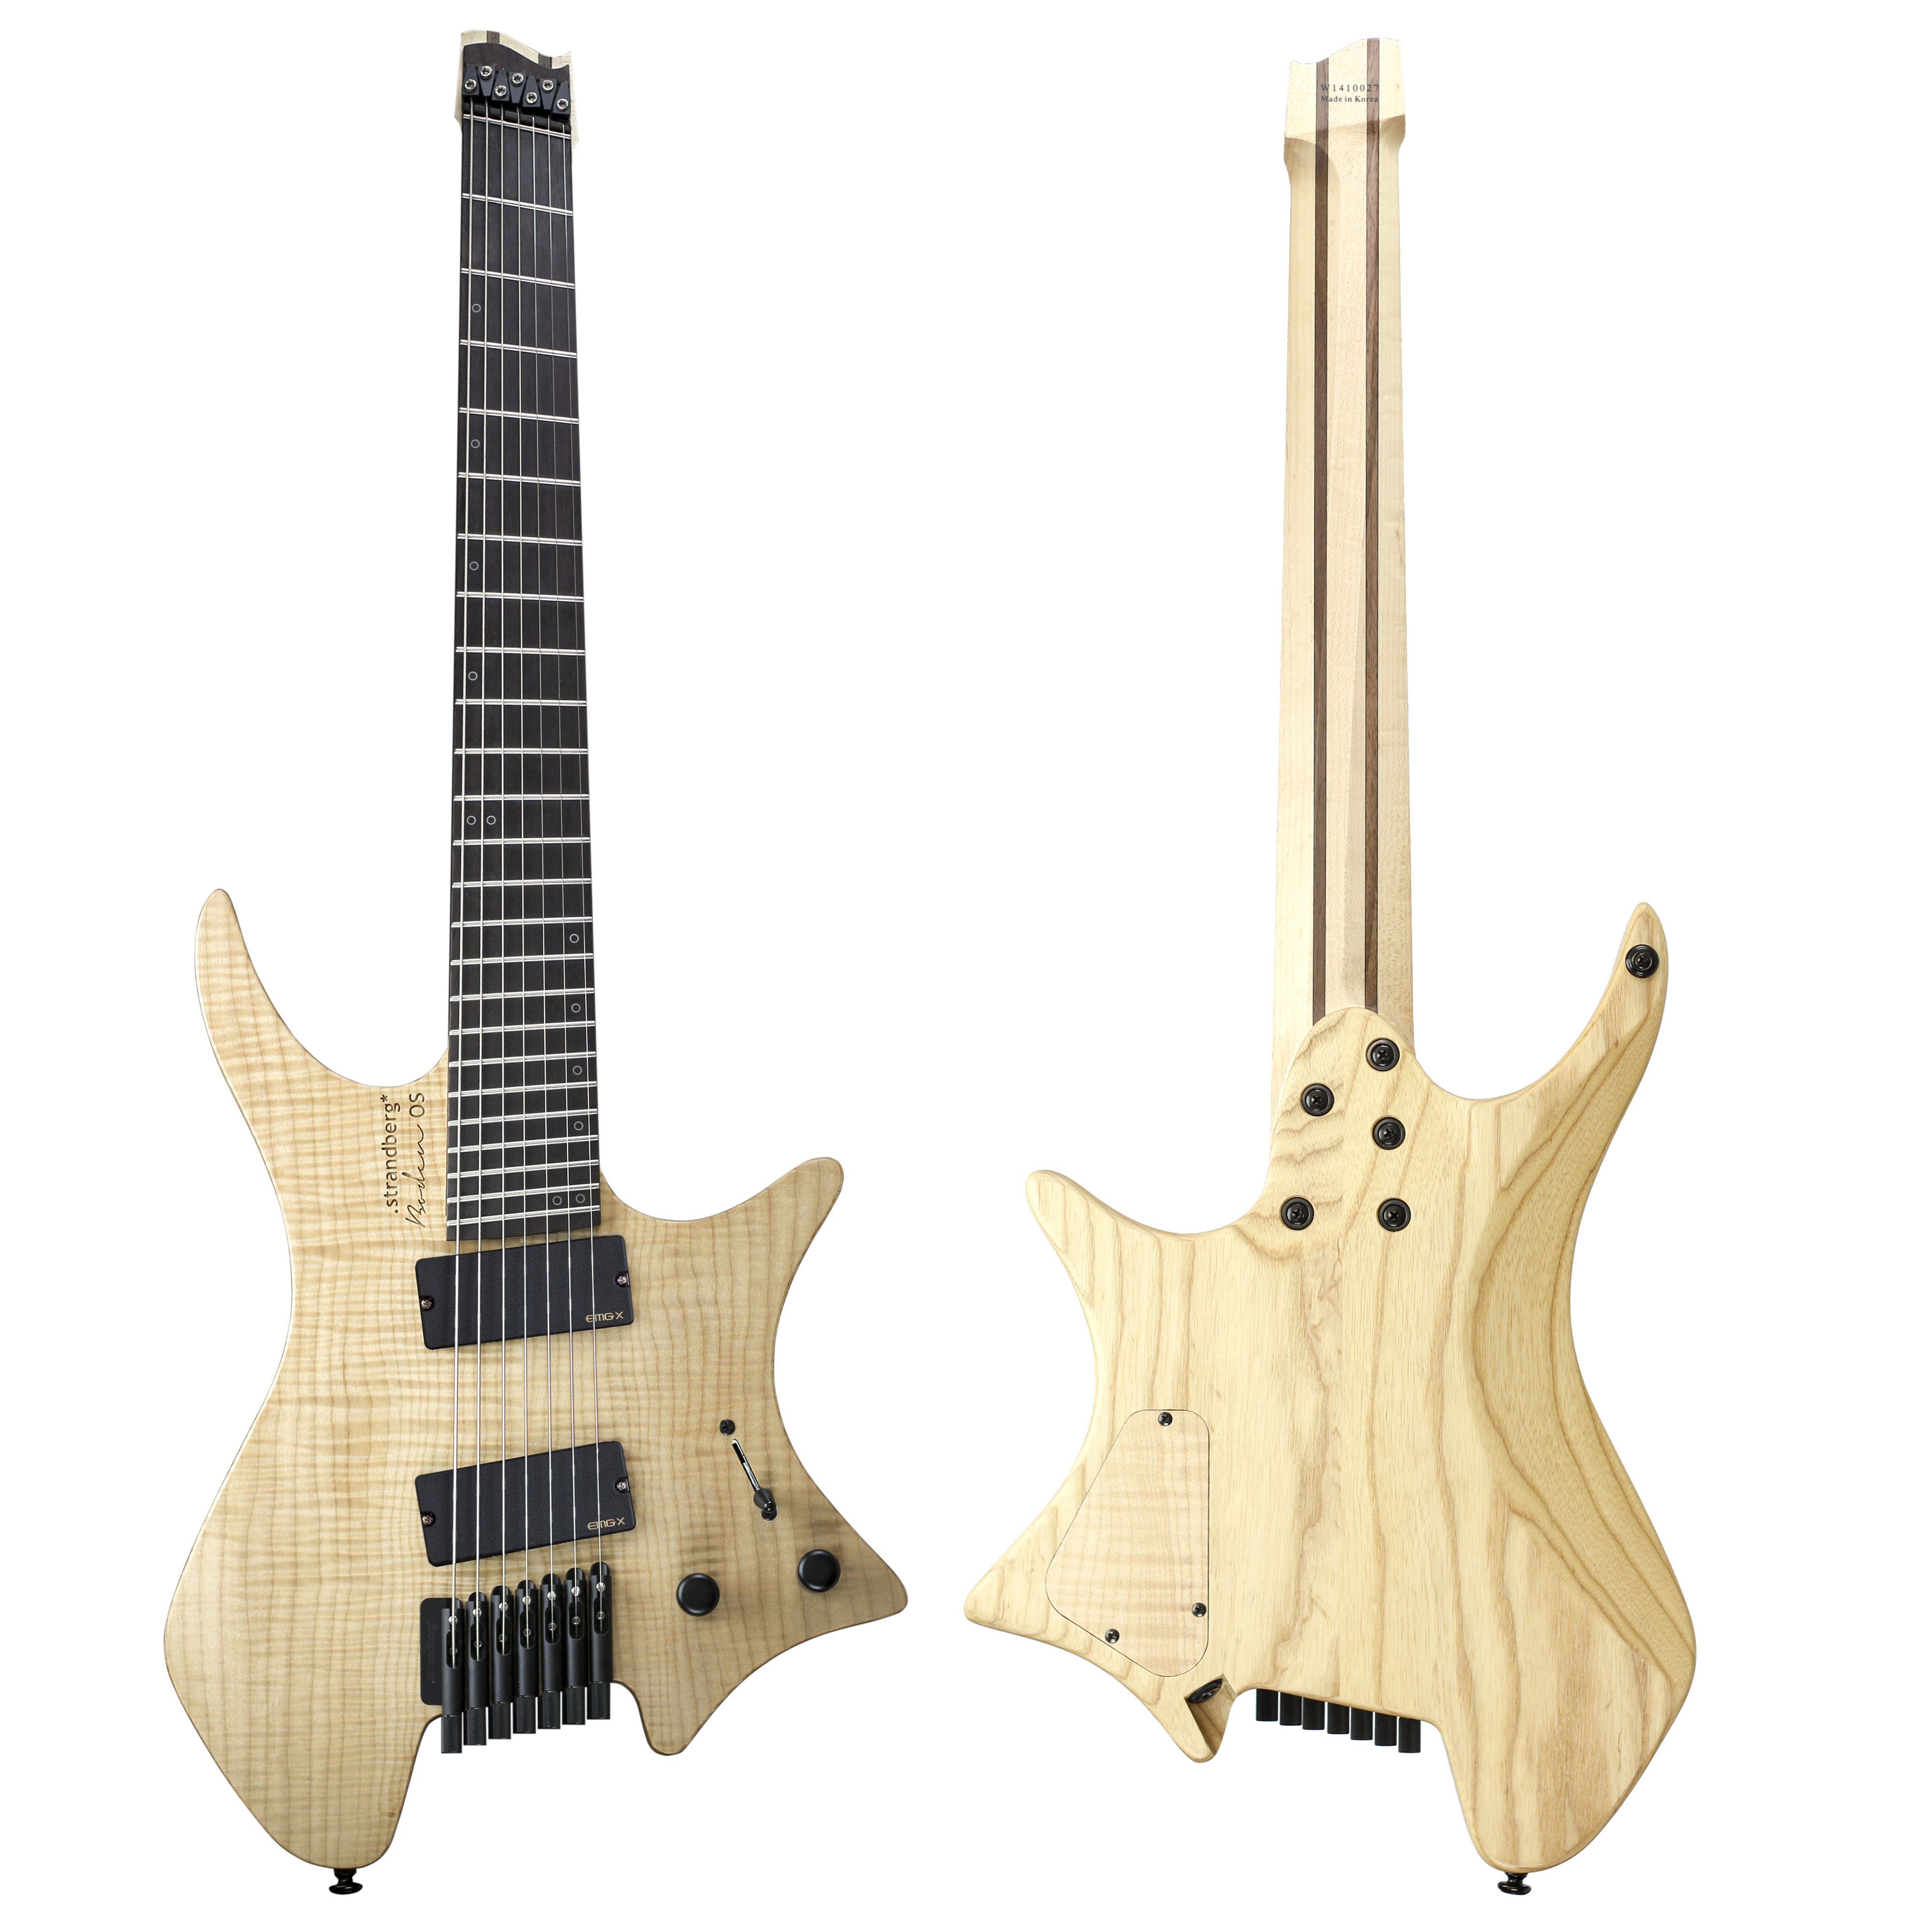 Review Strandberg Boden Os 7 Seven String Guitar Video Guitarworld Electricguitarcouk Lesson Electric Anatomy